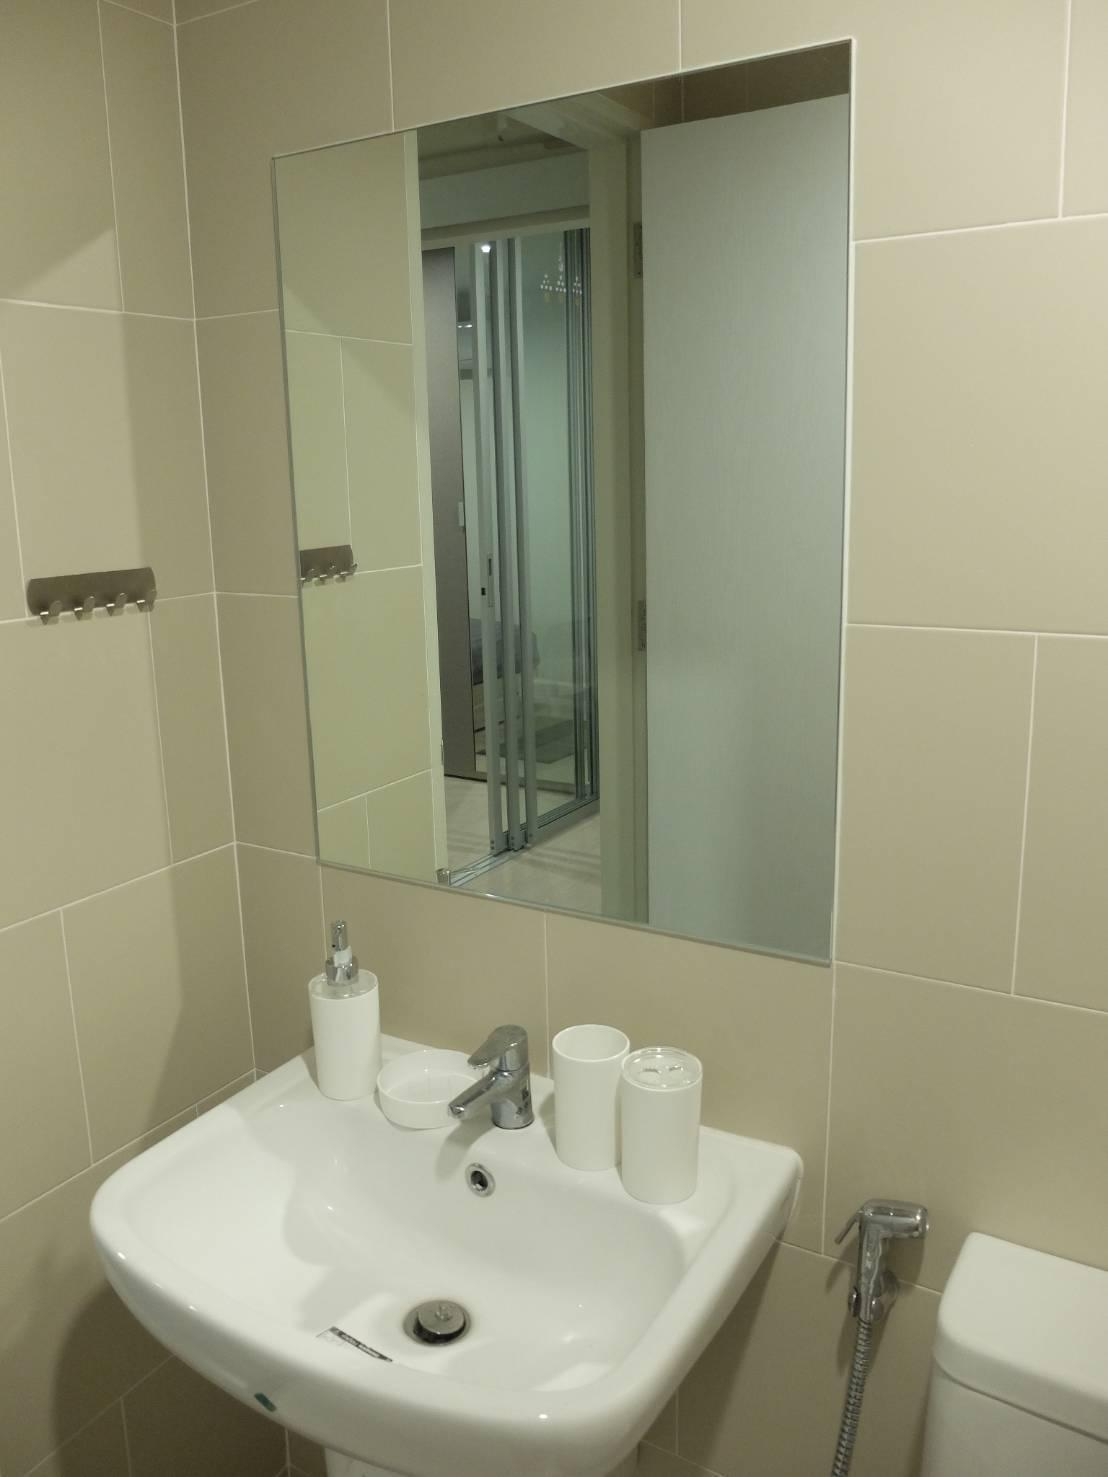 Sukhumvit 113. 3min from bts station อพาร์ตเมนต์ 1 ห้องนอน 1 ห้องน้ำส่วนตัว ขนาด 28 ตร.ม. – บางนา